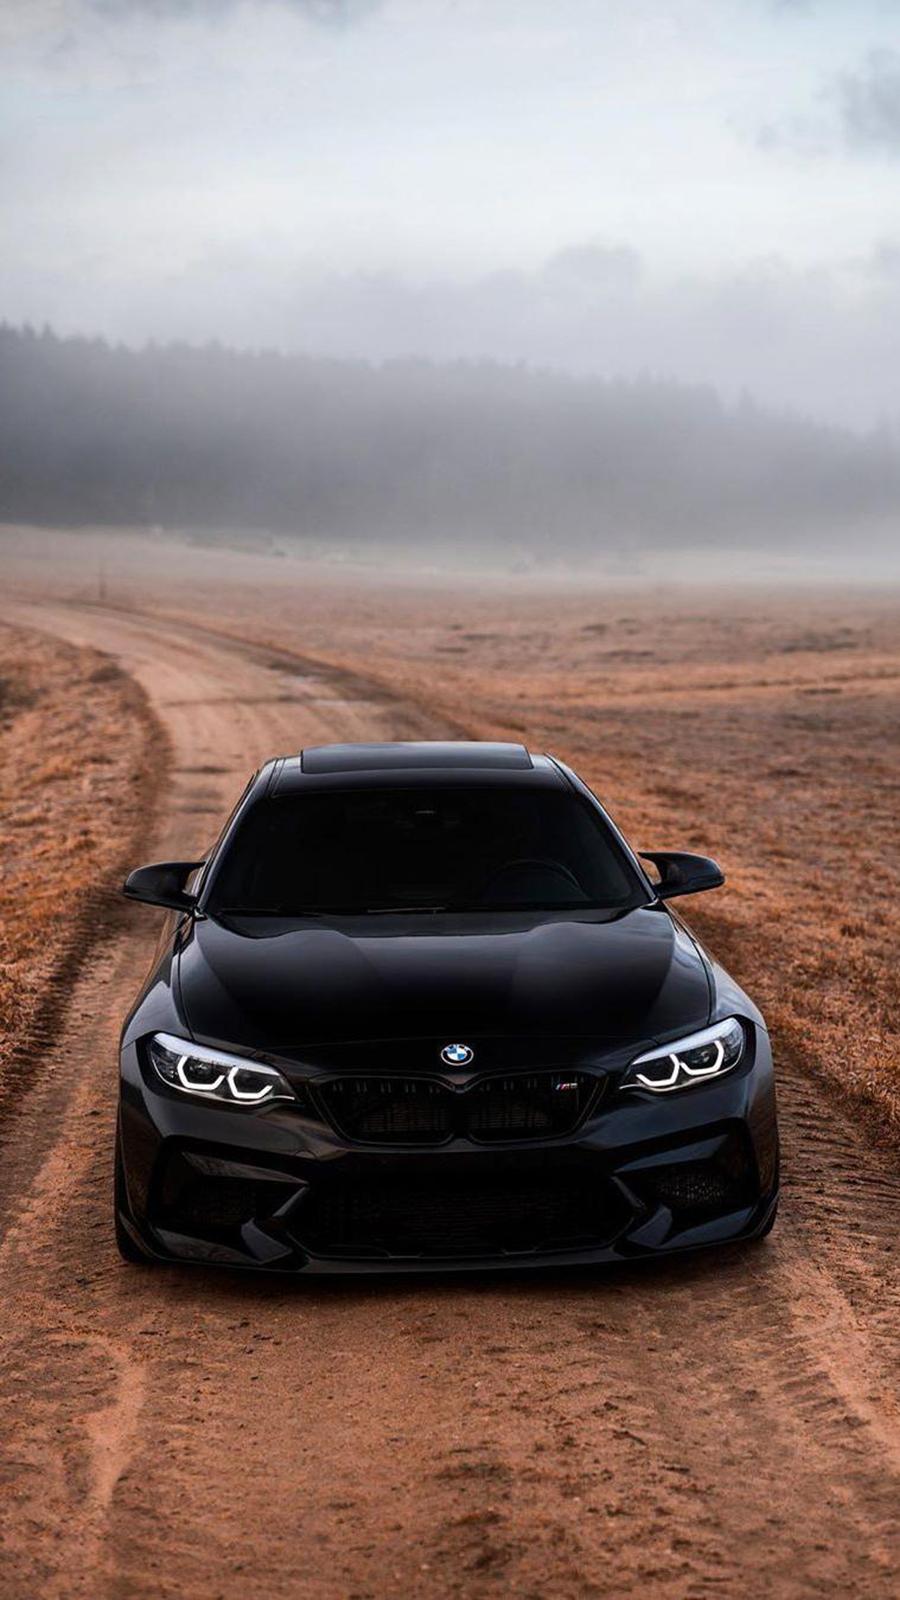 BMW M2 Wallpaper – Most Popular BMW Wallpapers Free Download